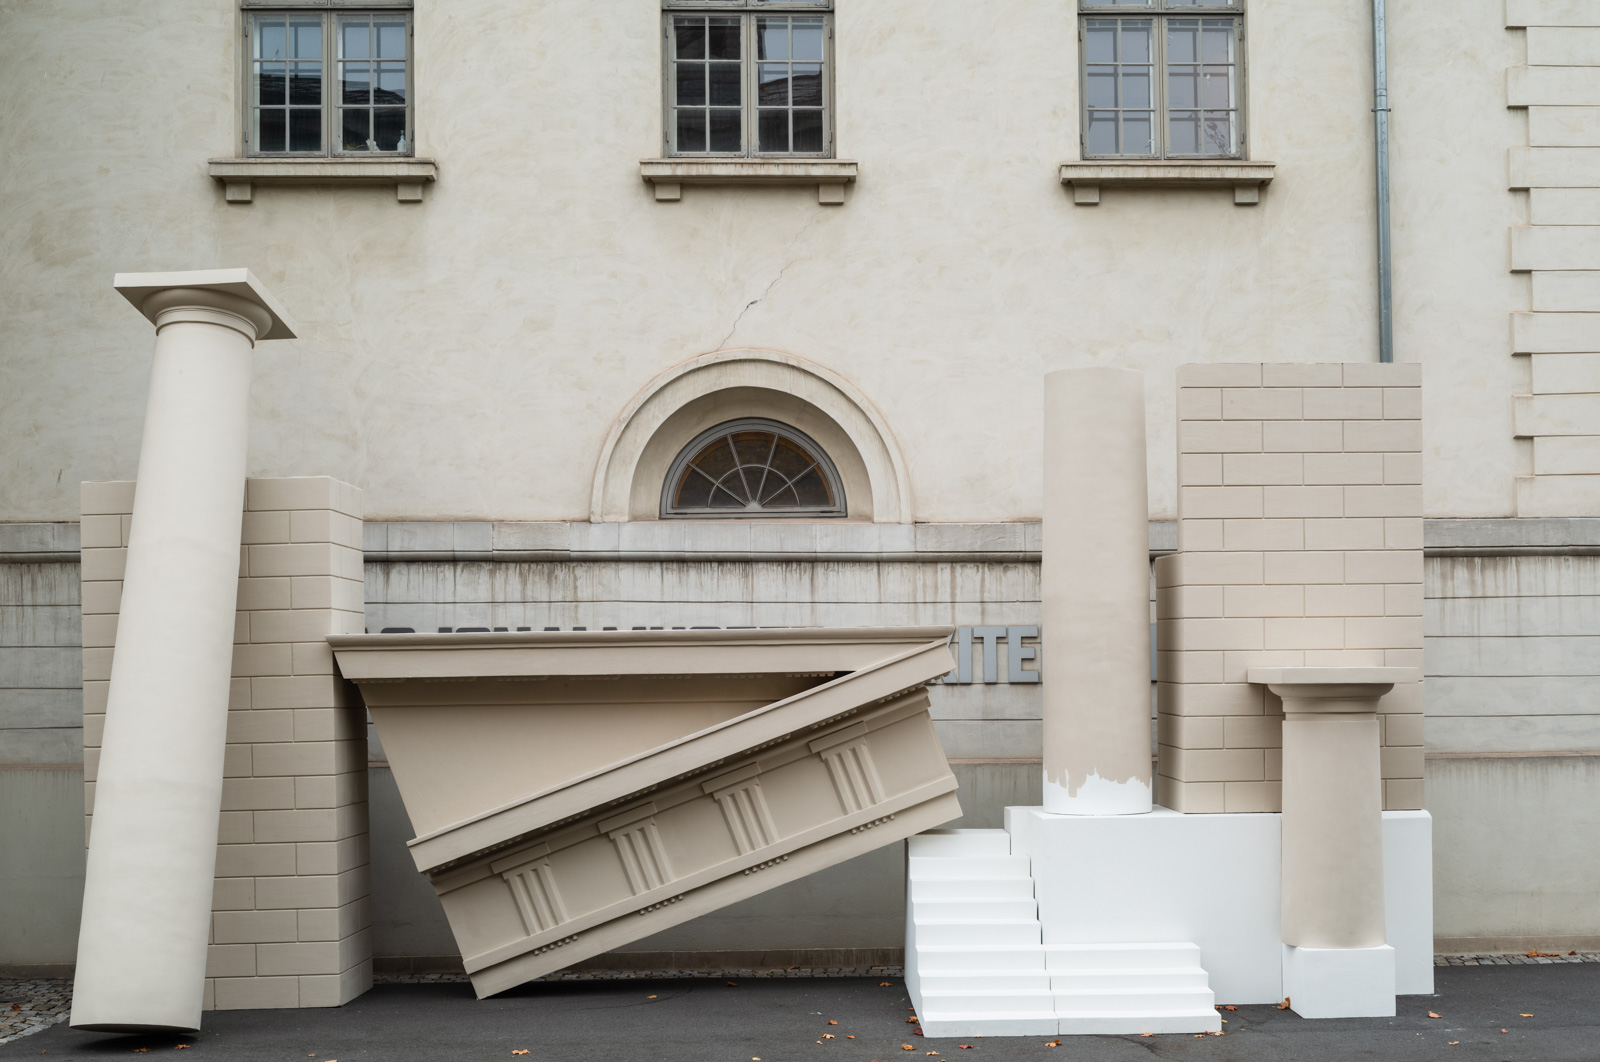 Installation view, Potemkinby, Nasjonalmuseet Arkitektur / Noplace, Photo: Damian Heinisch